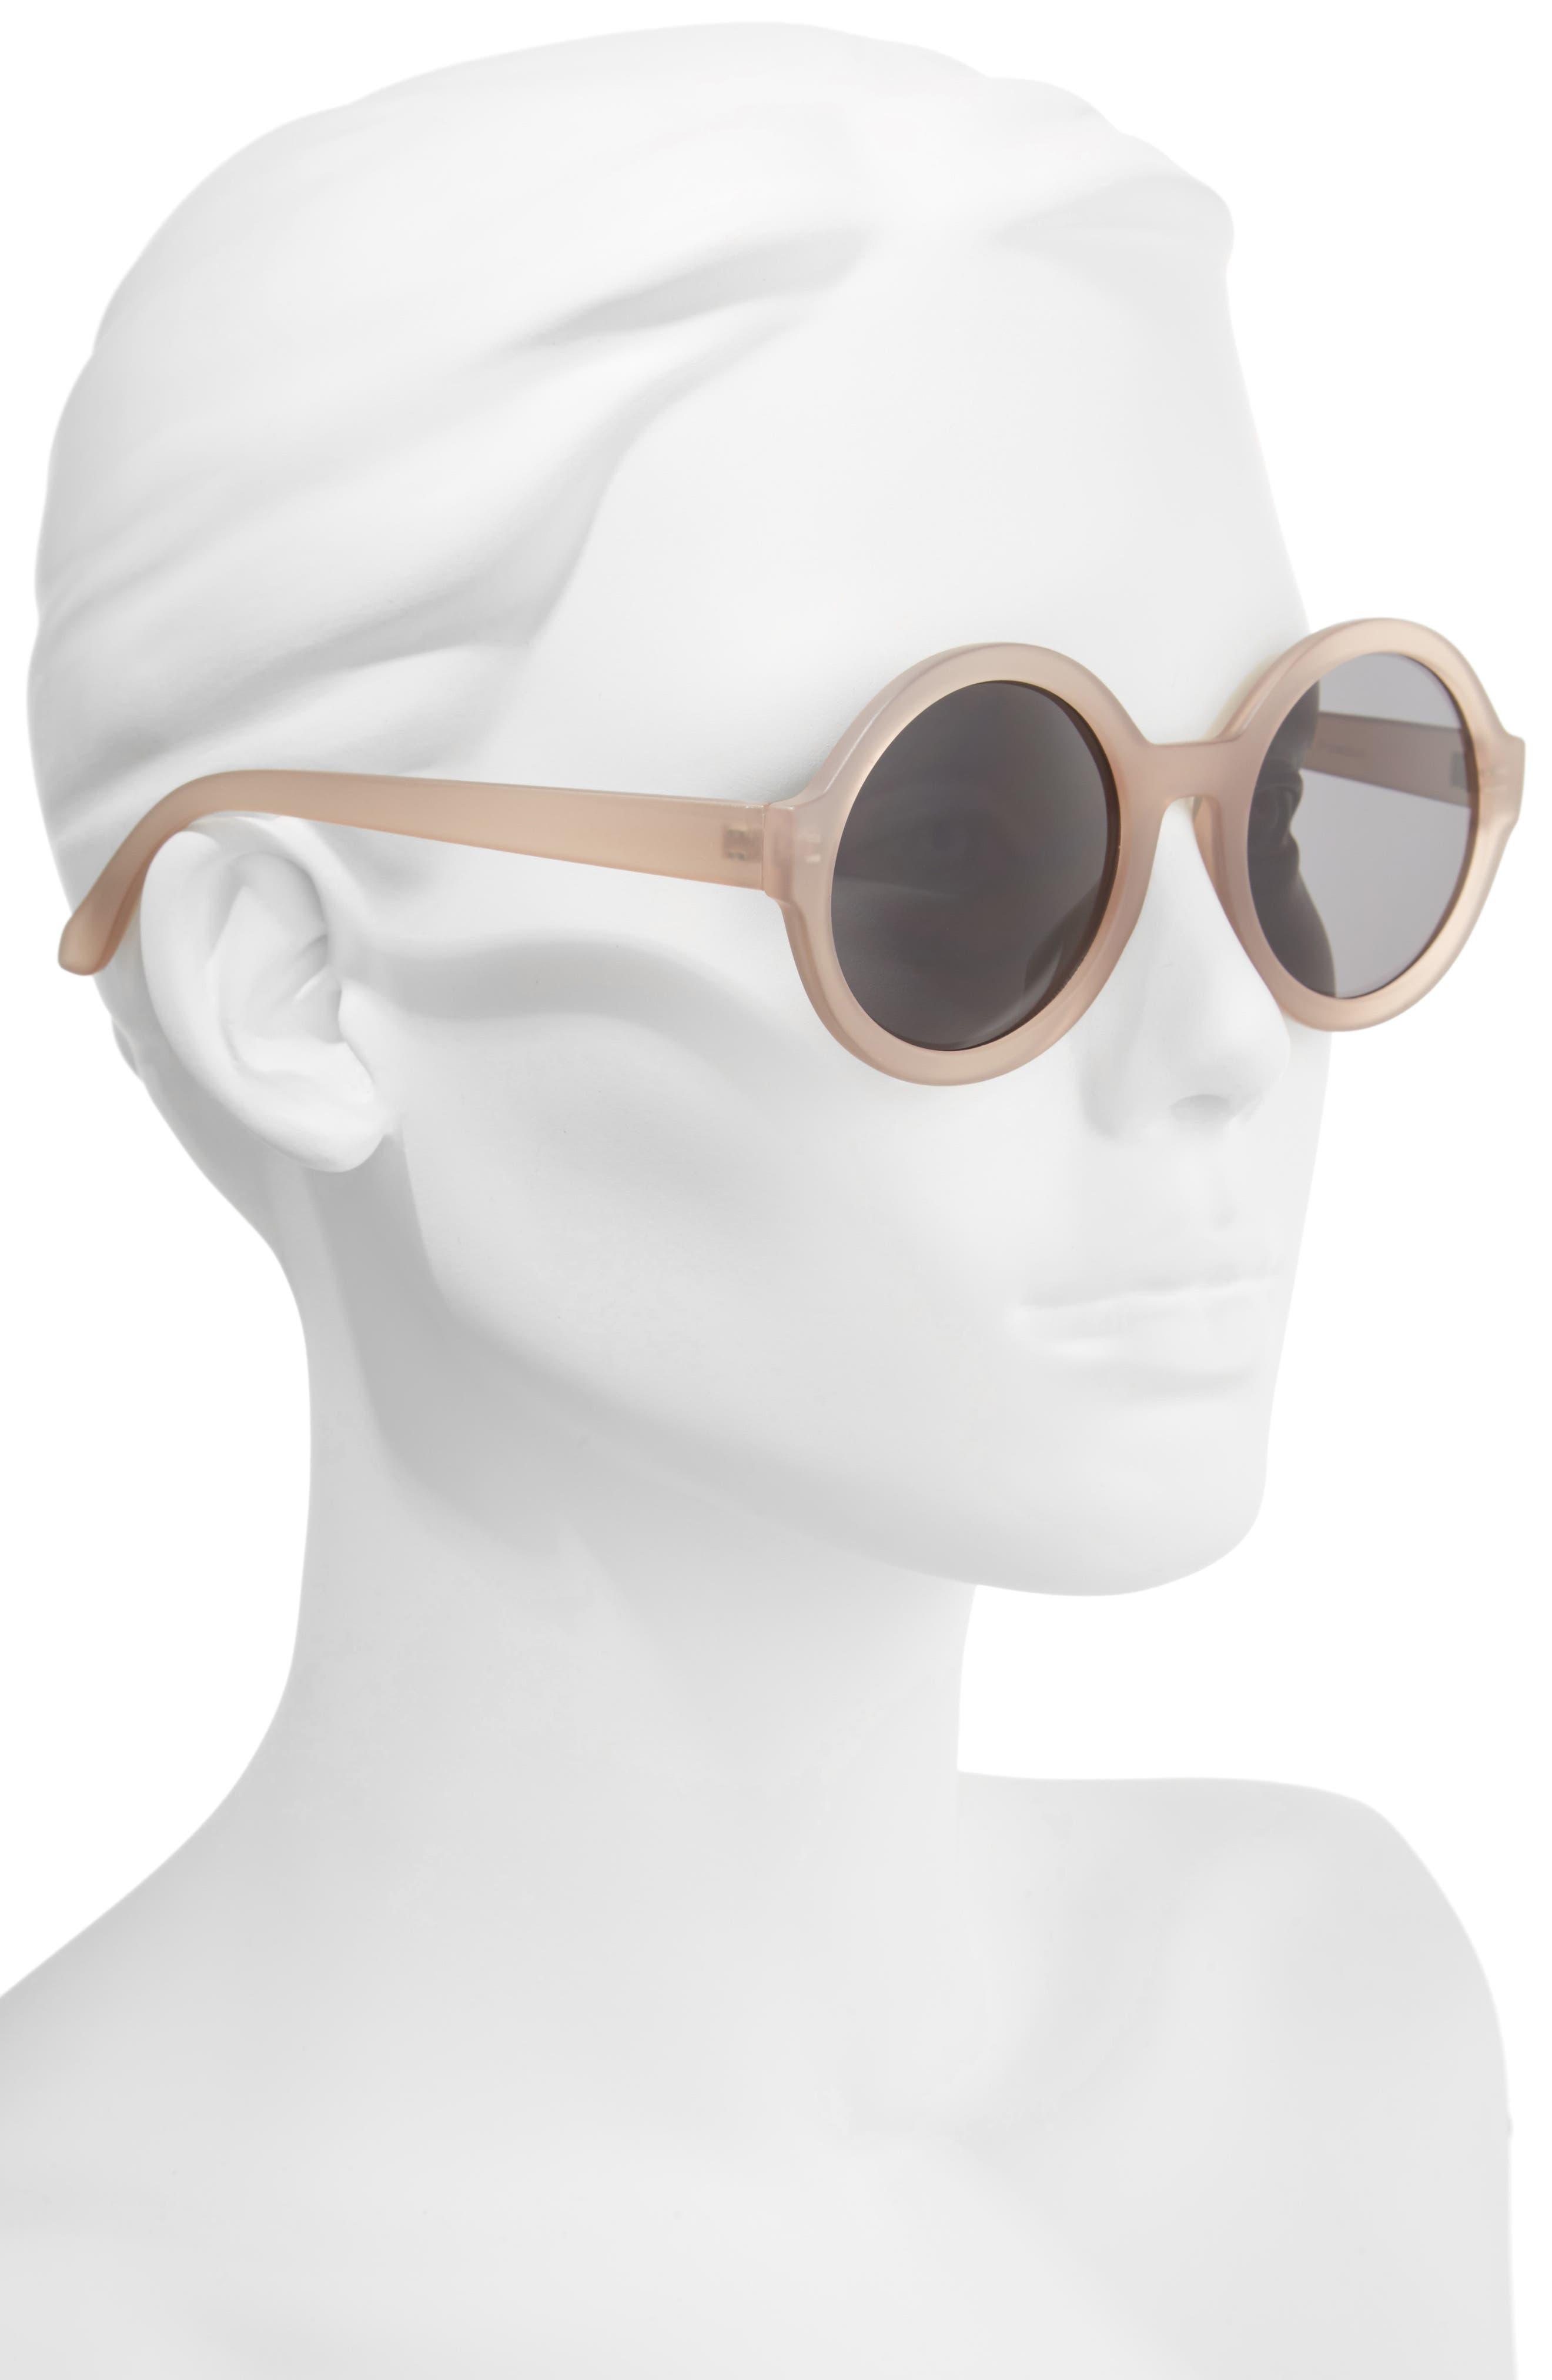 50mm Round Sunglasses,                             Alternate thumbnail 2, color,                             Mauve